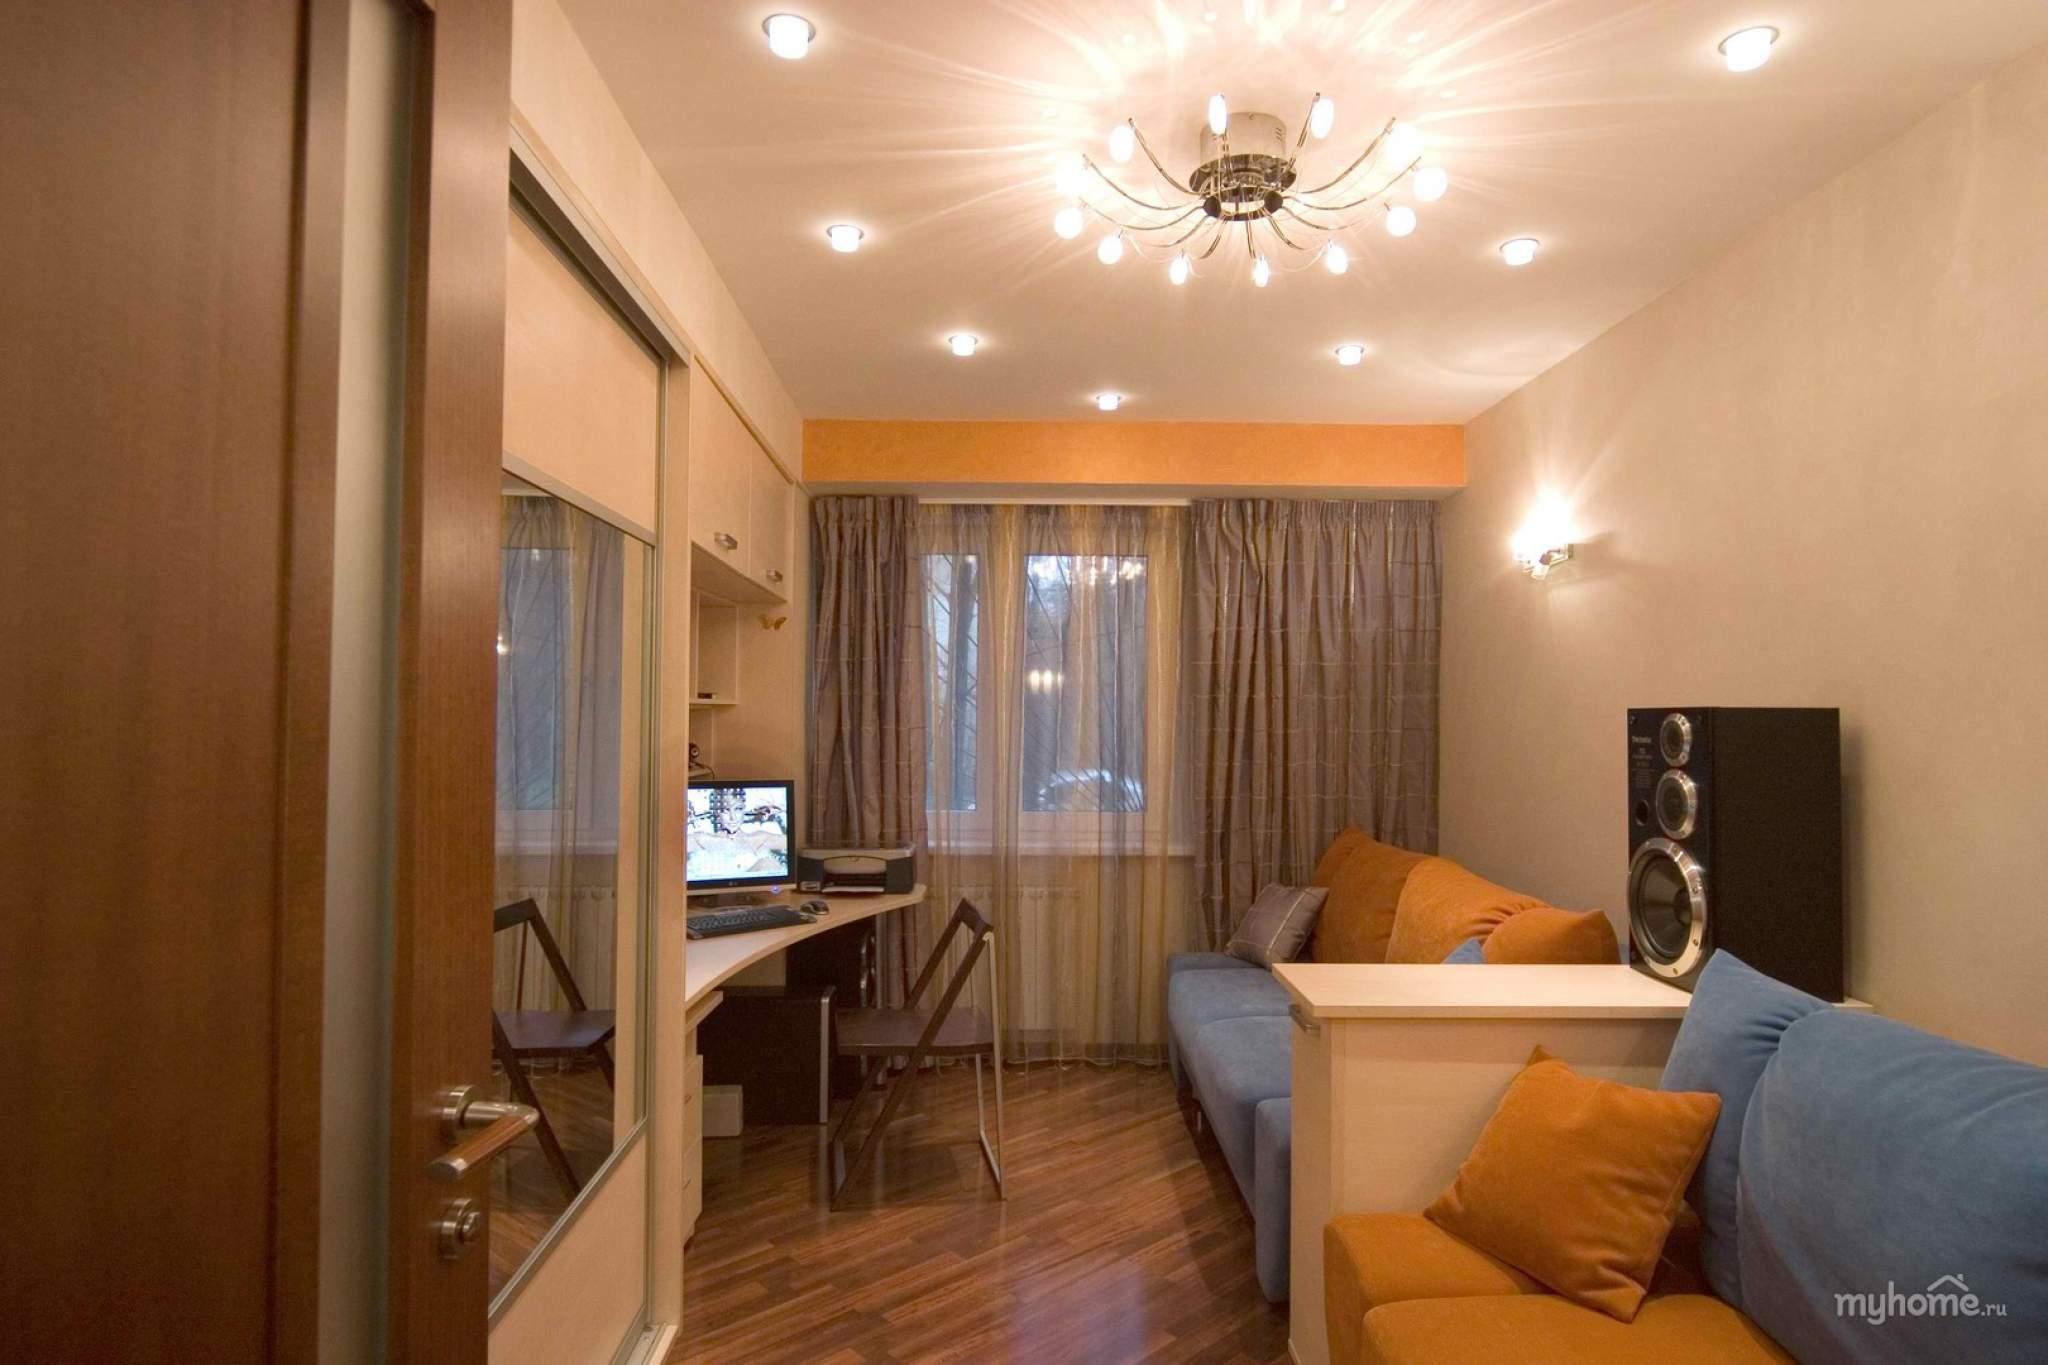 Малогабаритная двухкомнатная квартира дизайн